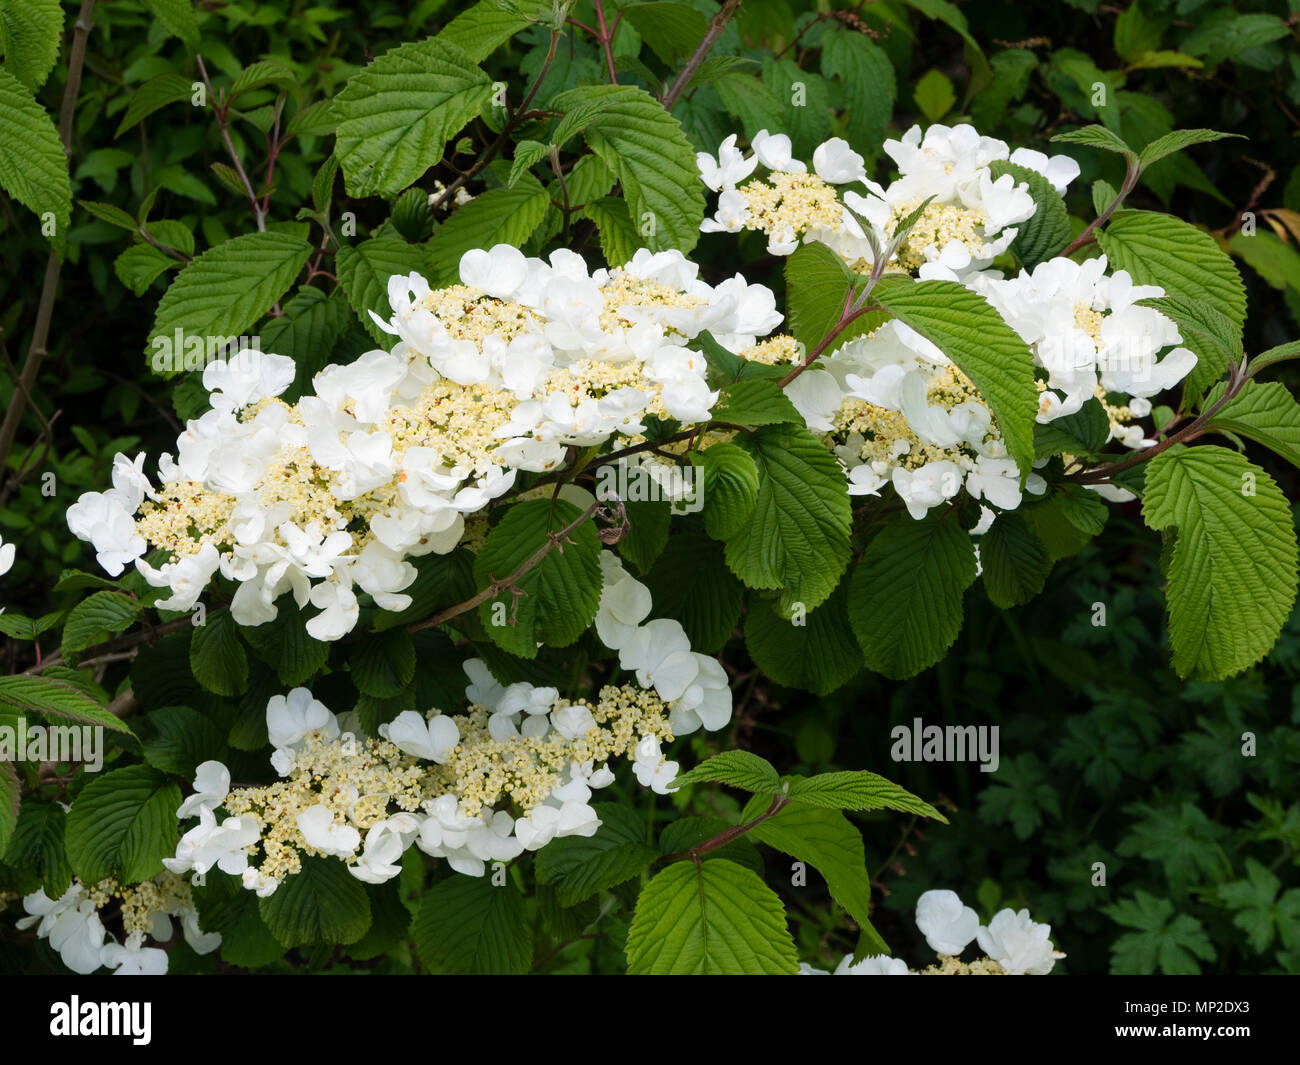 Tiered deciduous branching and late spring lacecap flowers of the hardy shrub, Viburnum plicatum f. tomentosum 'Mariesii' - Stock Image